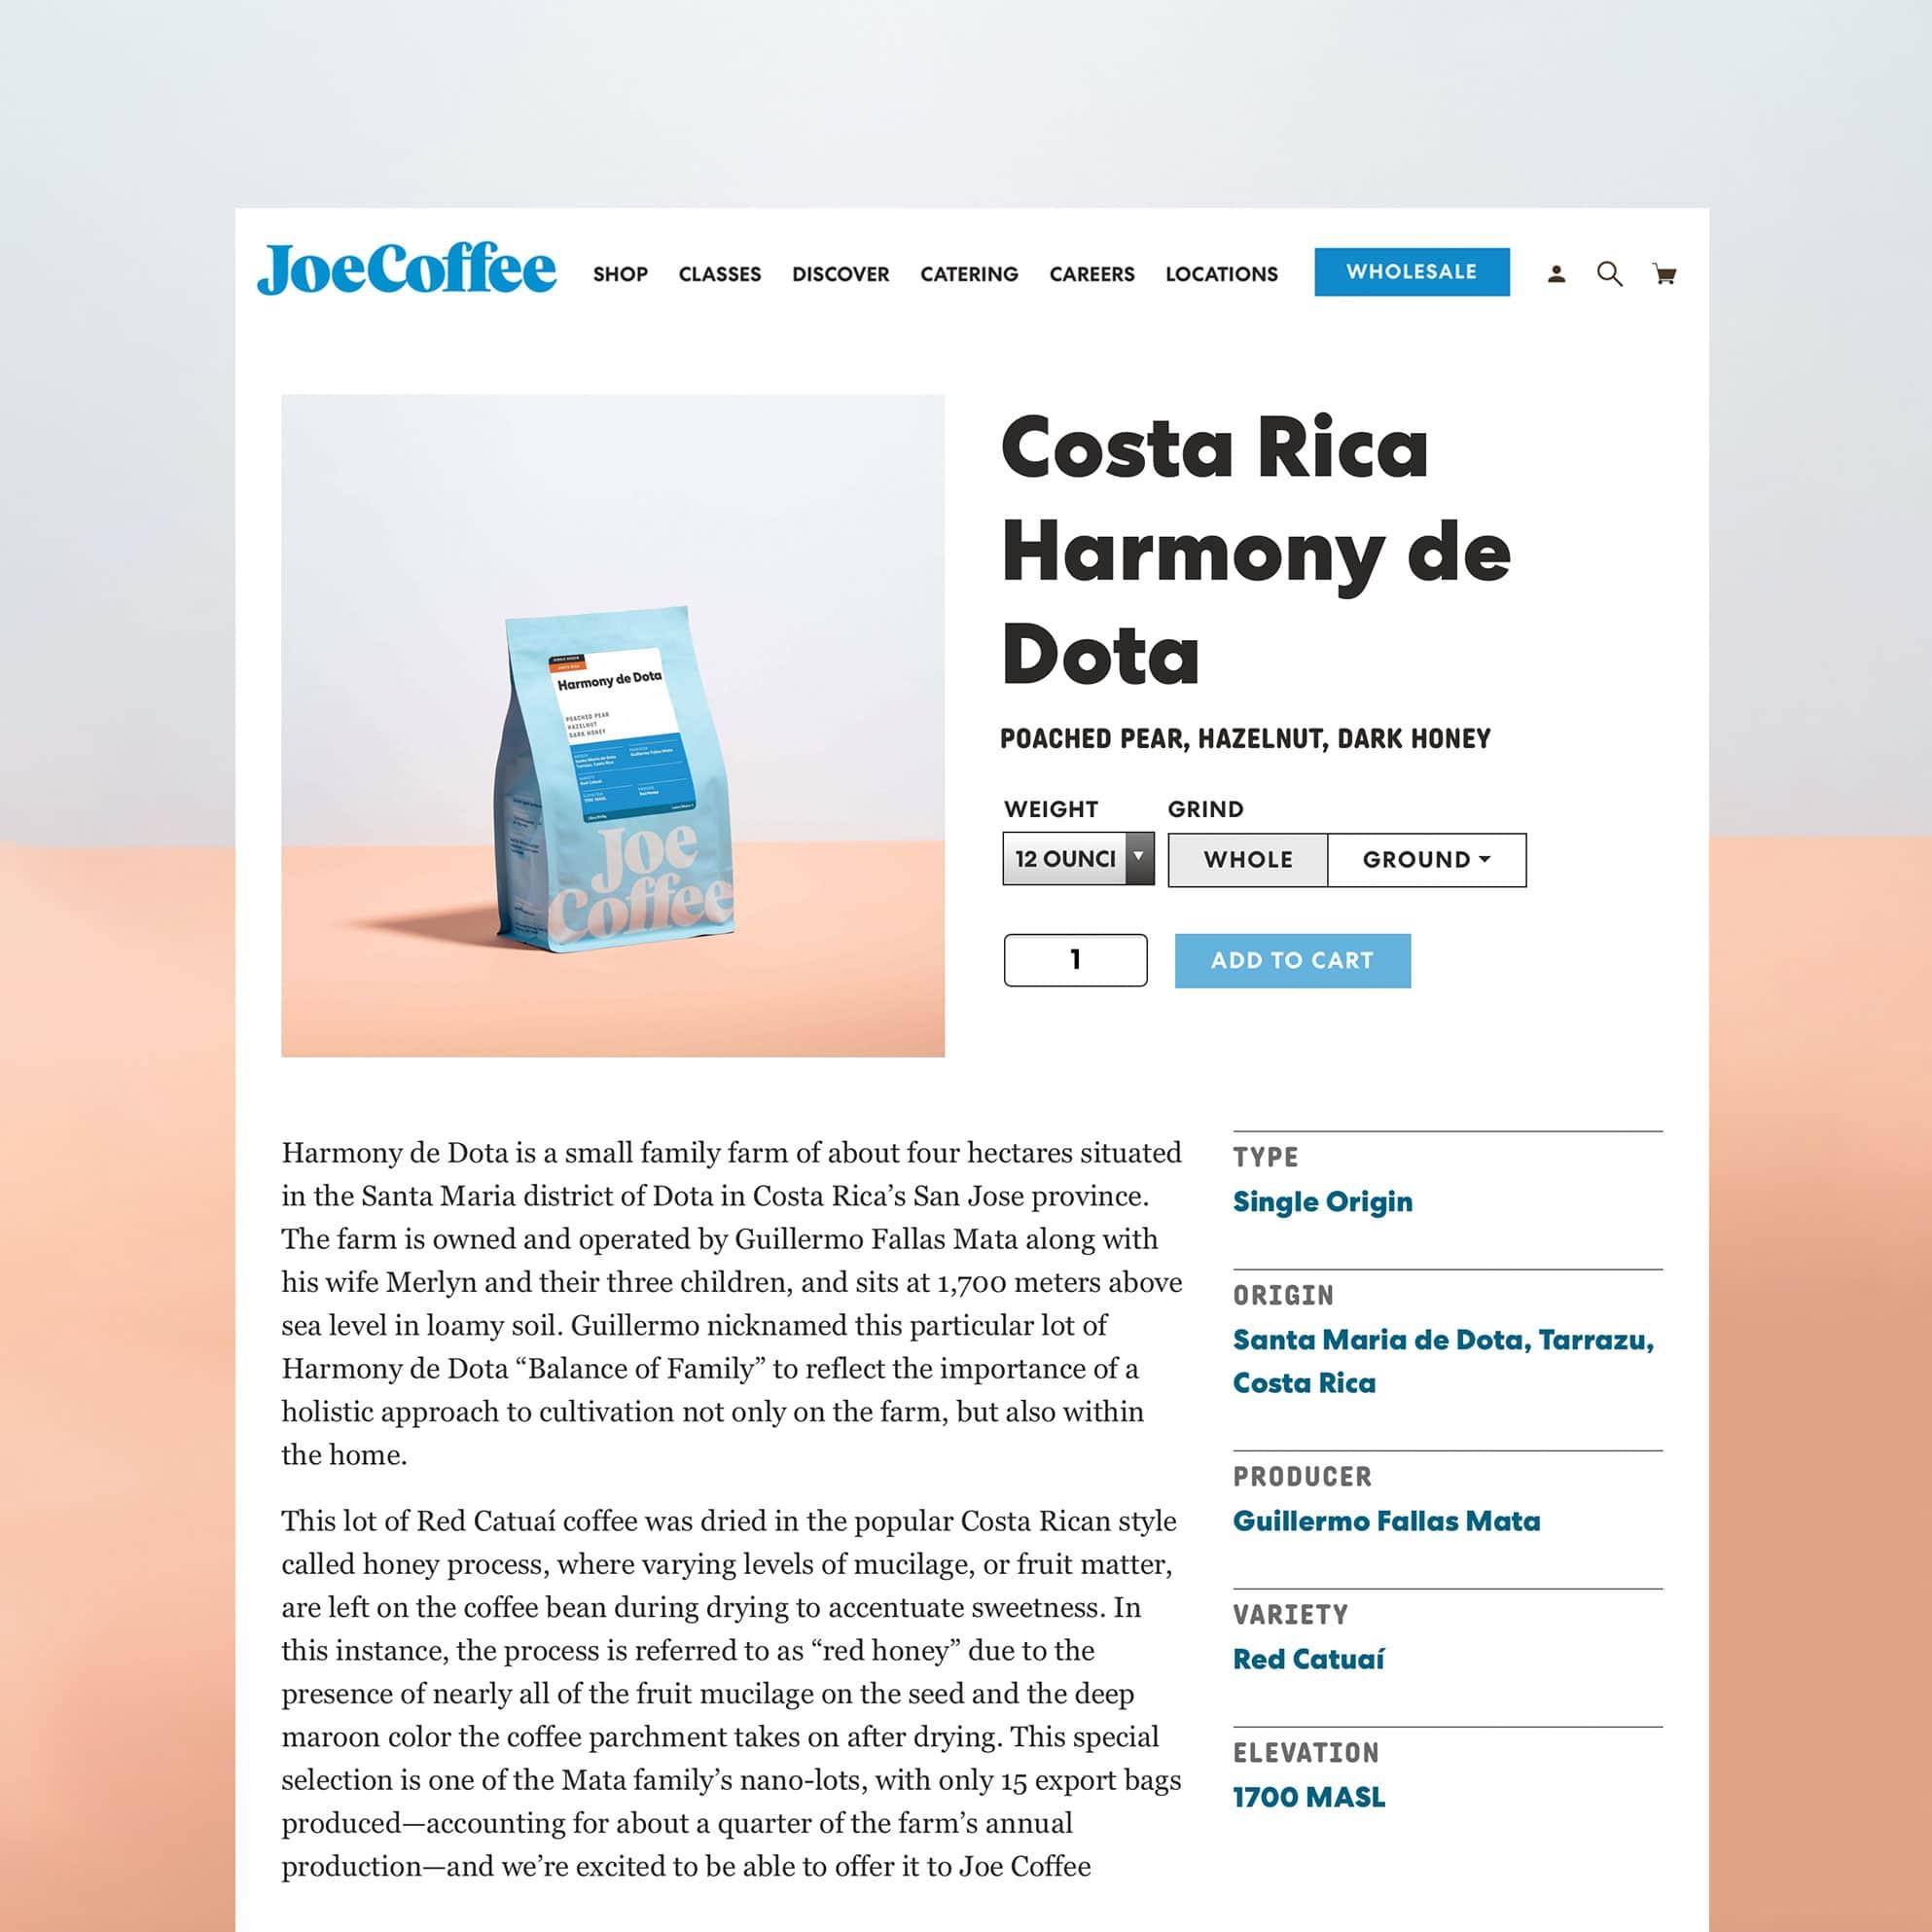 Costa Rica Harmony de Dota product page